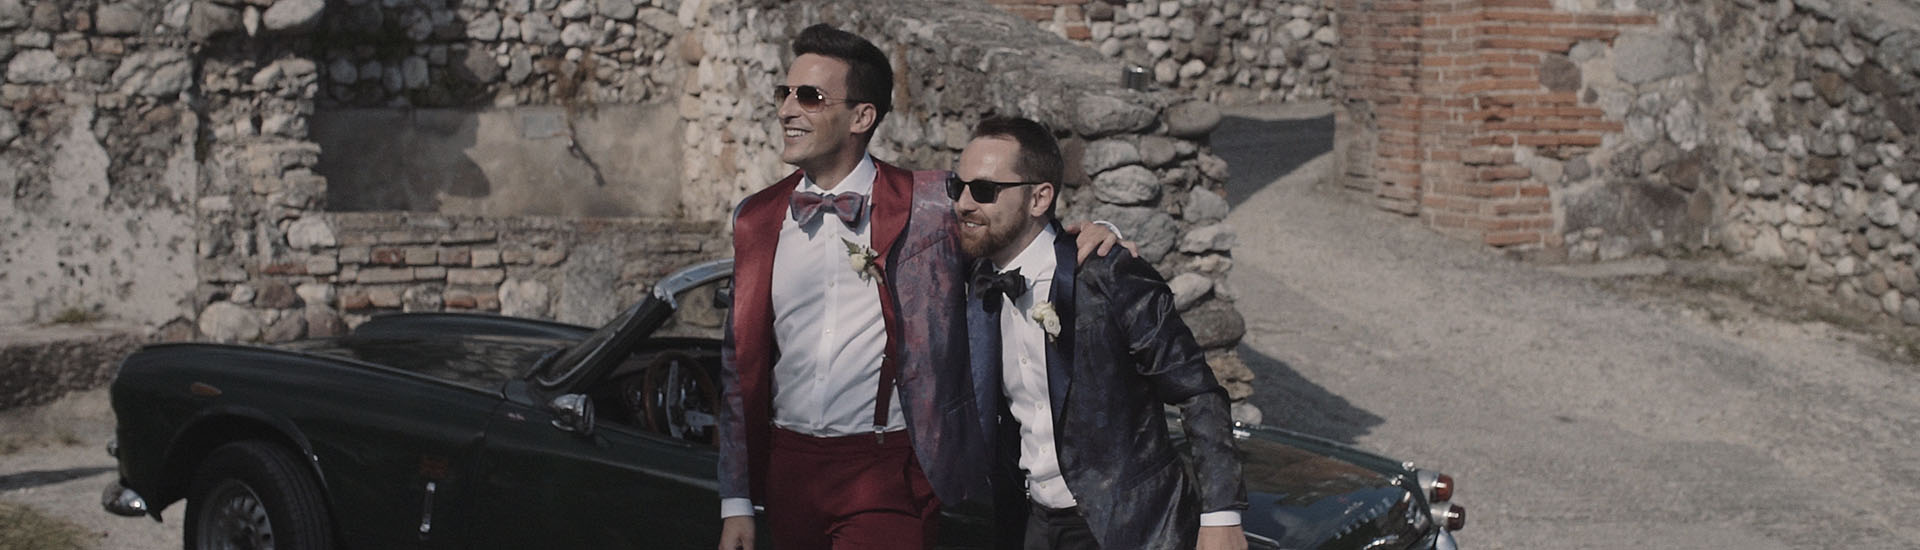 gay, wedding, stesso sesso, lago, garda,